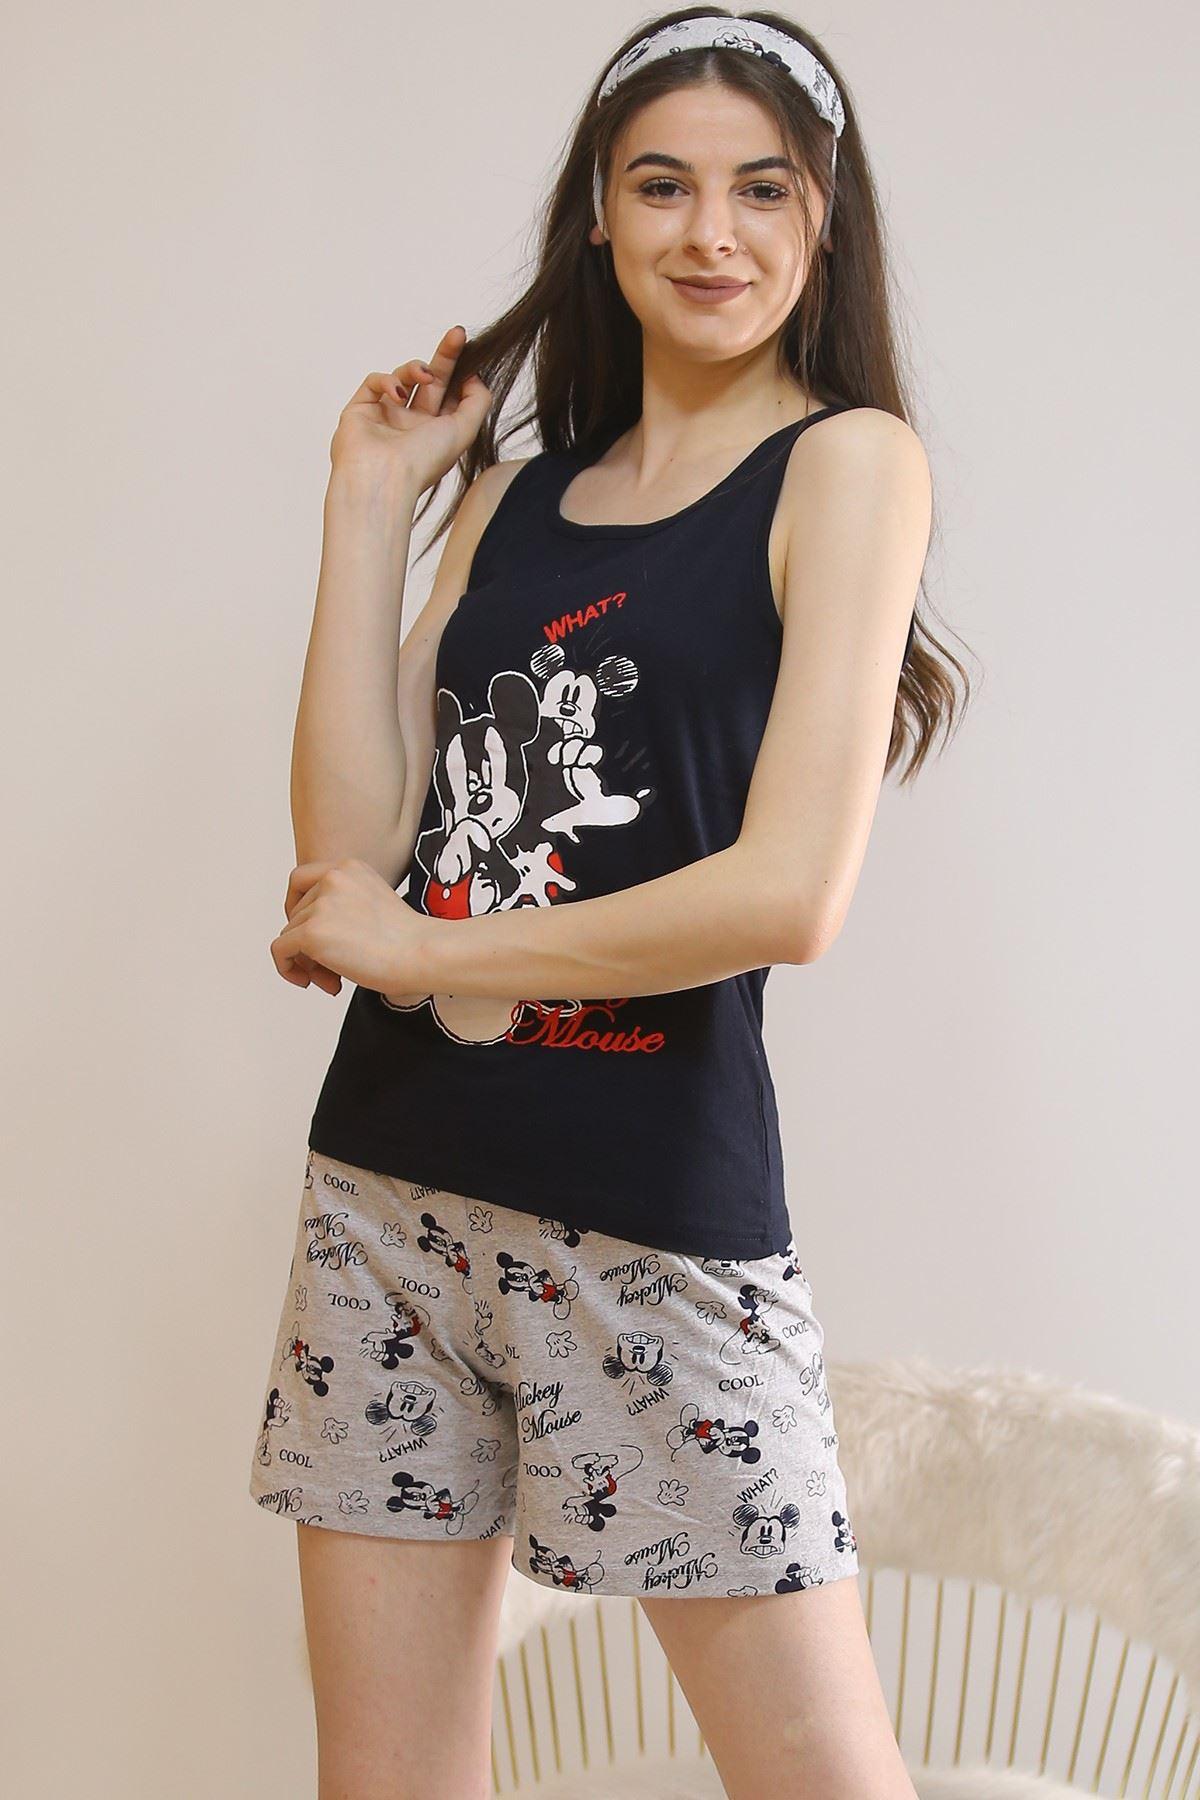 Şortlu Pijama Takımı Siyah - 5927.1059.